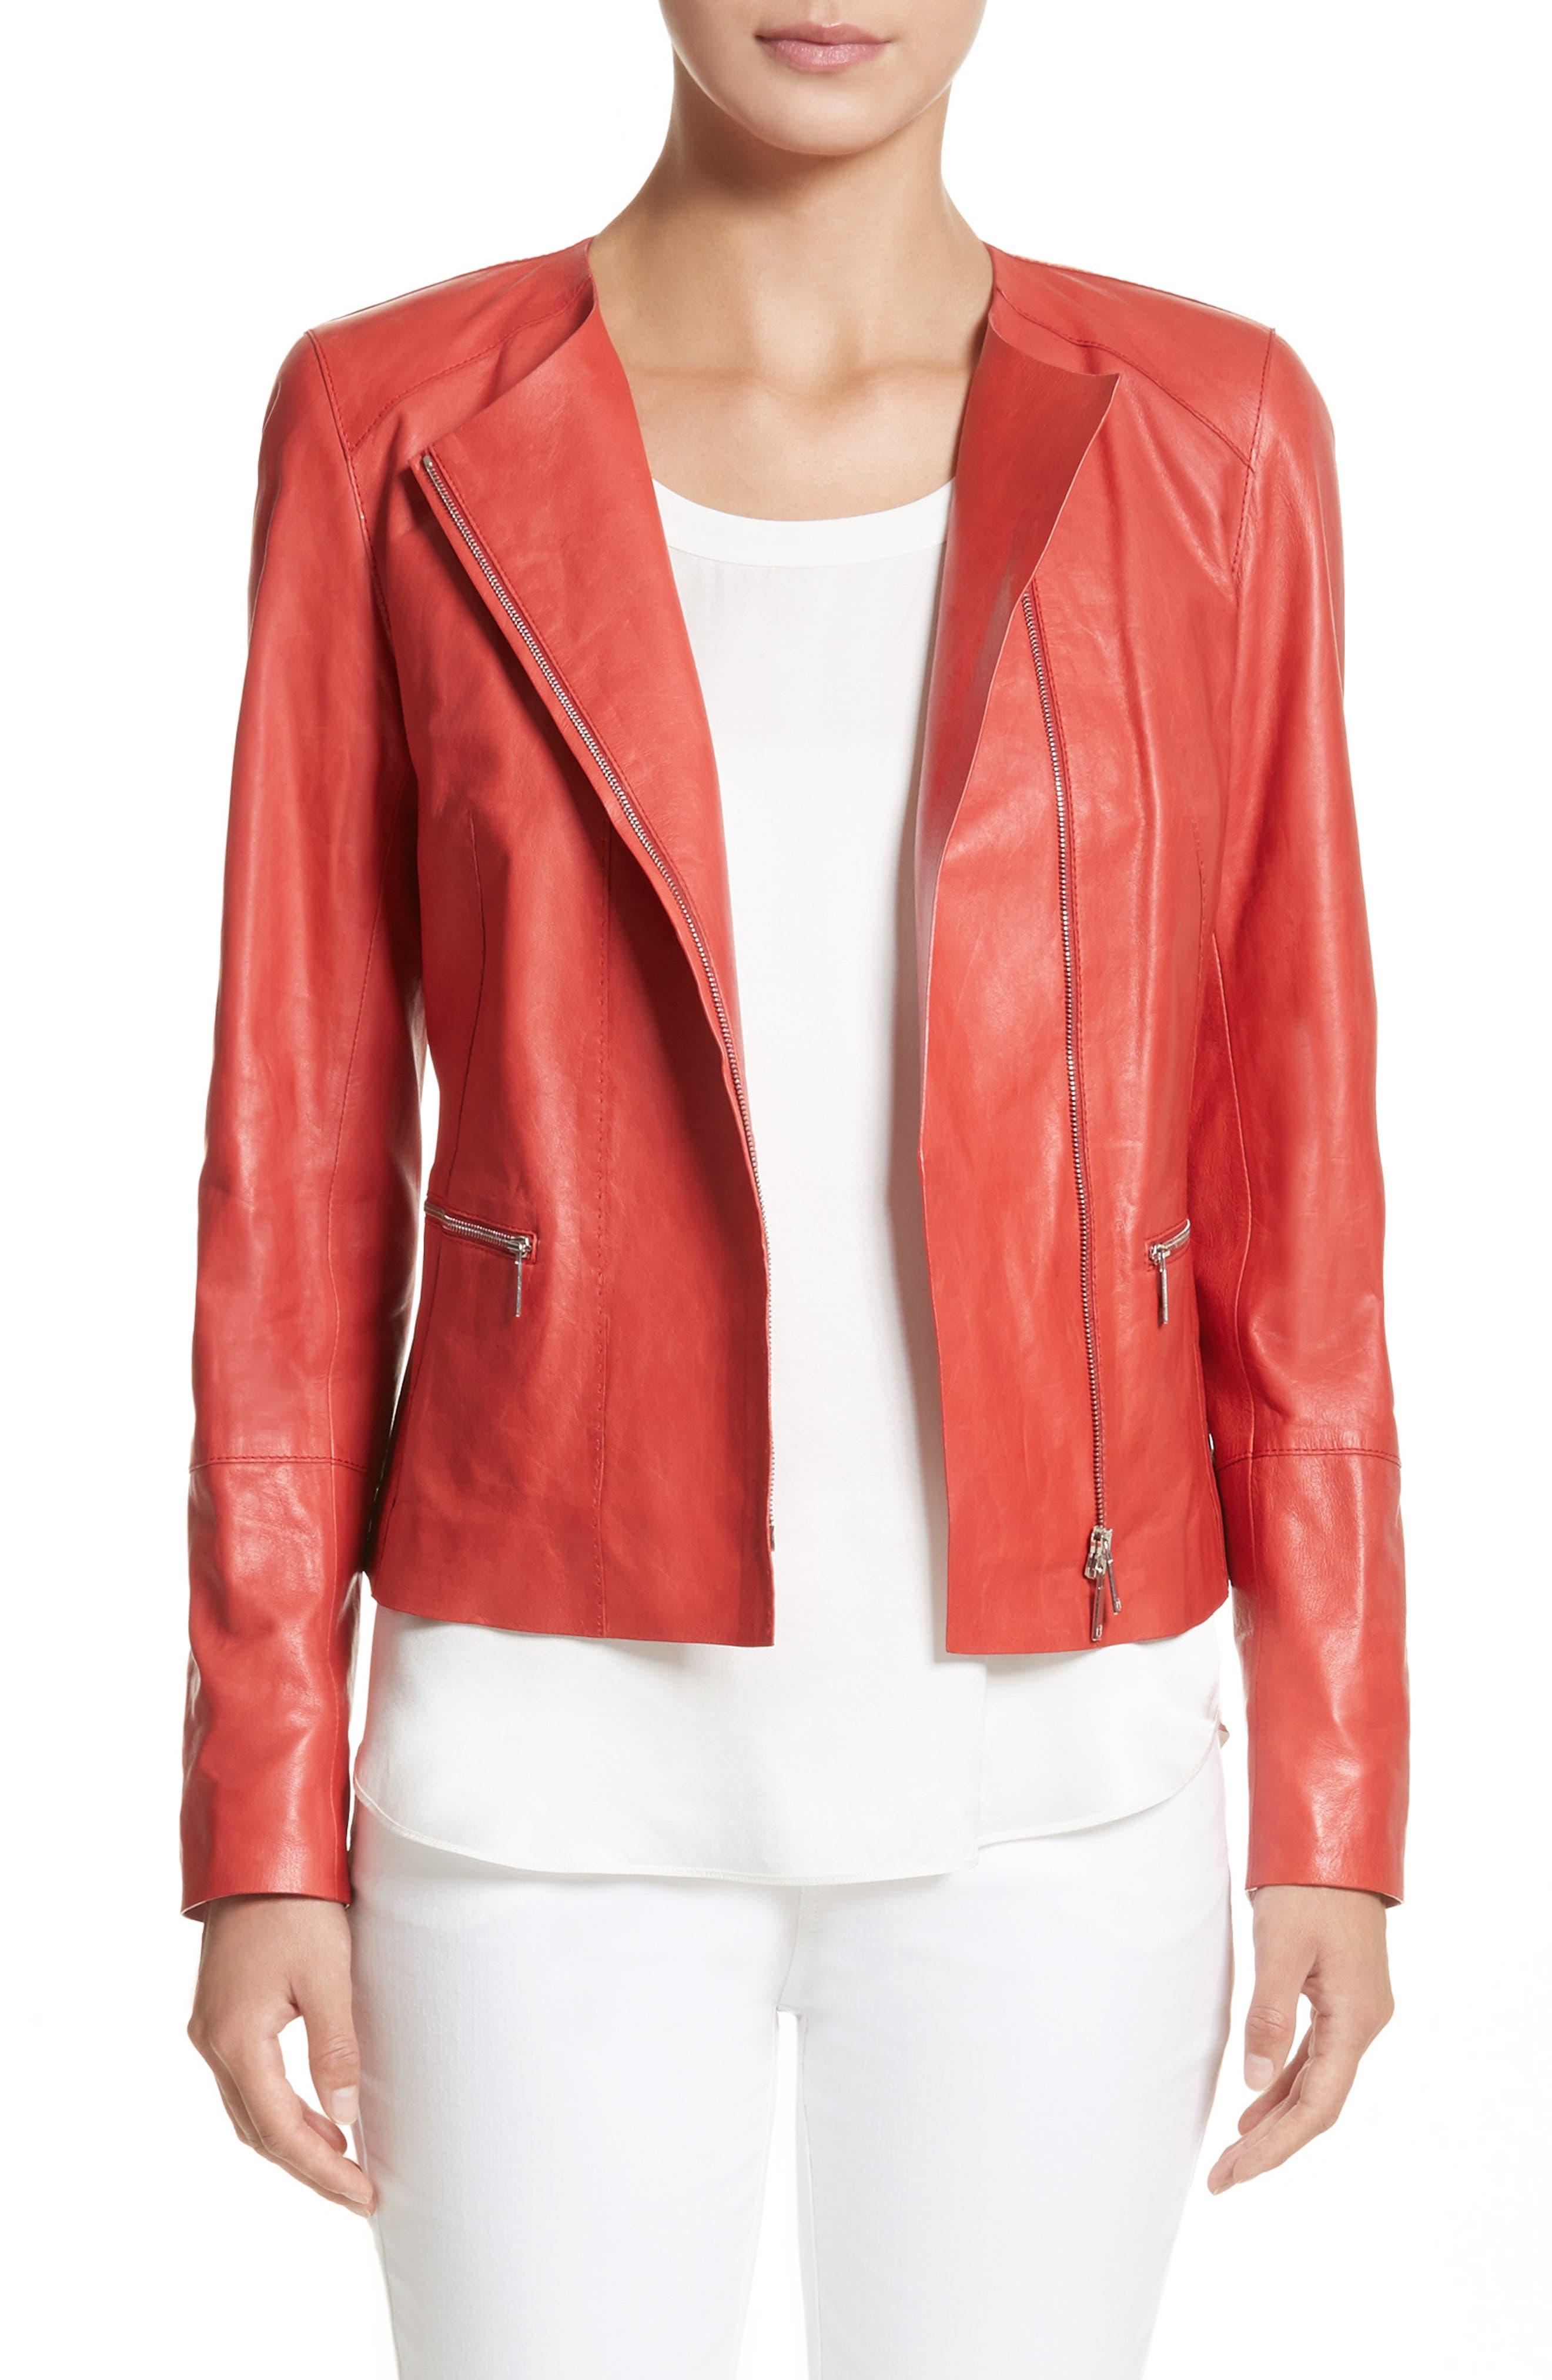 Caridee Glazed Lambskin Leather Jacket,                         Main,                         color, Salsa